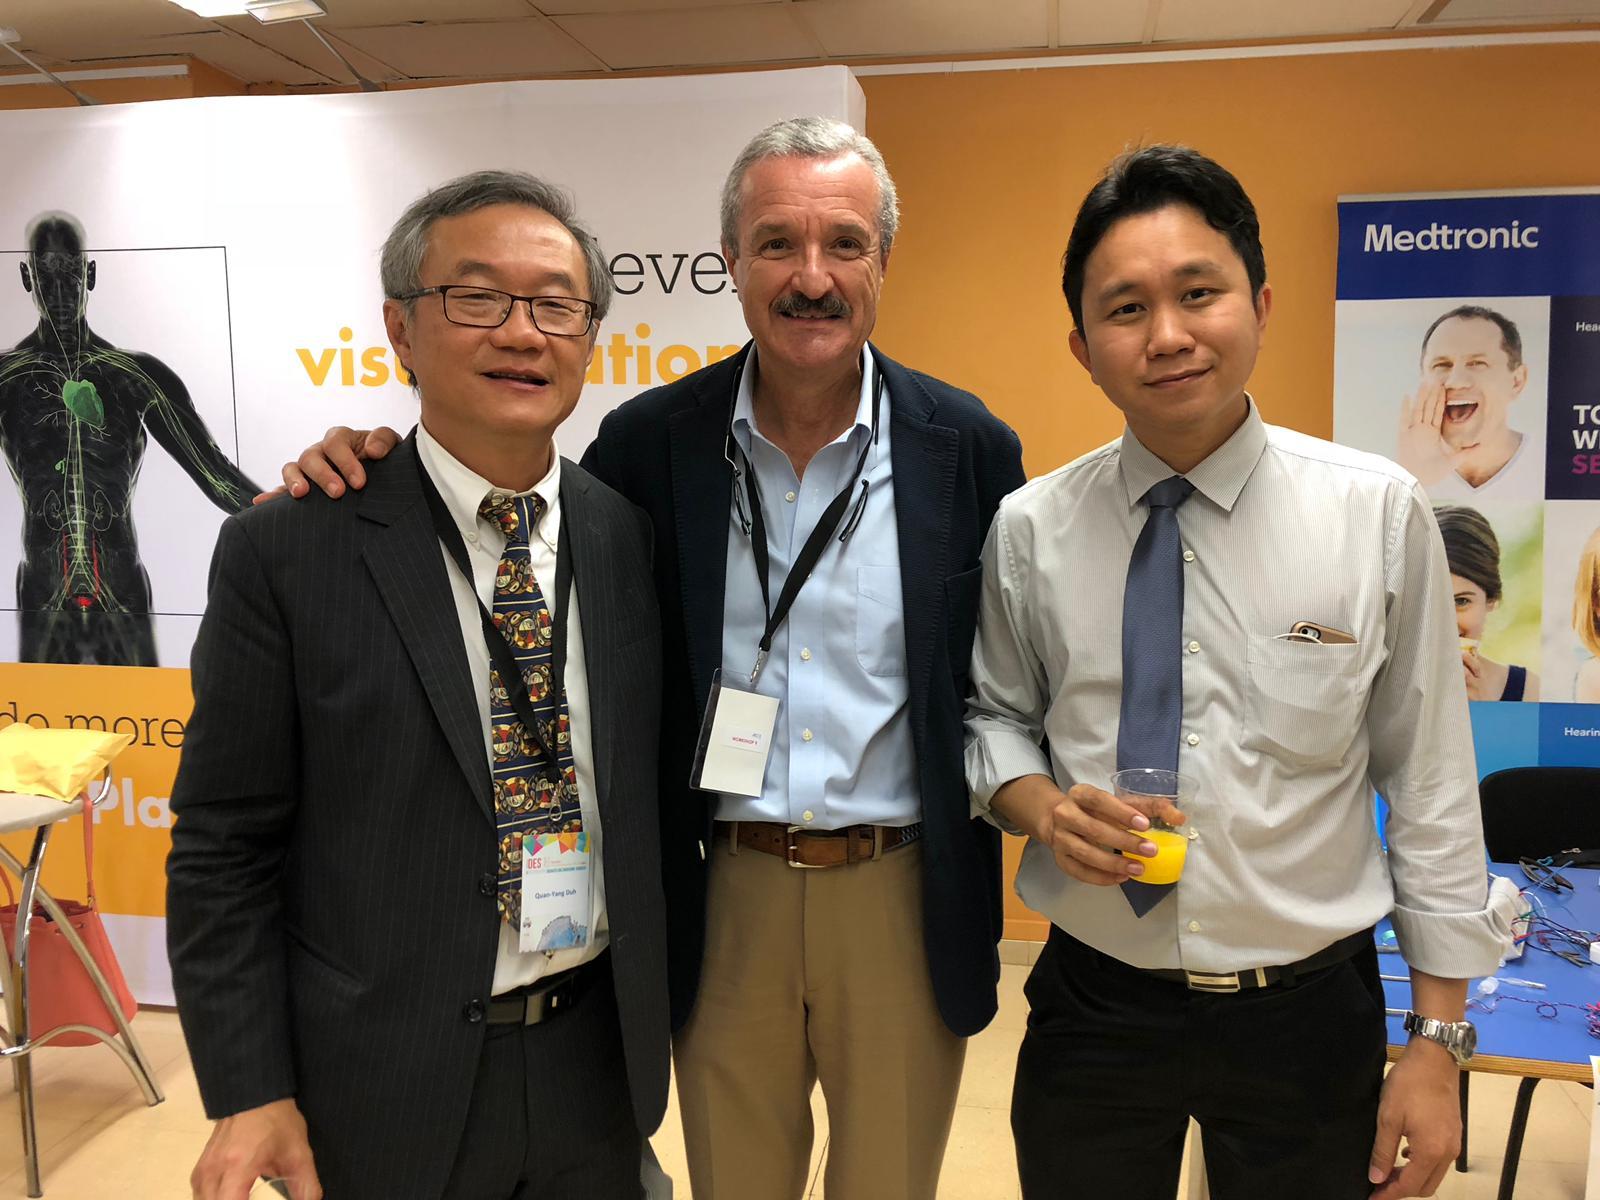 Con el Dr. Quan-Yang (USA) y Dr. Anuwong (Tailandia)